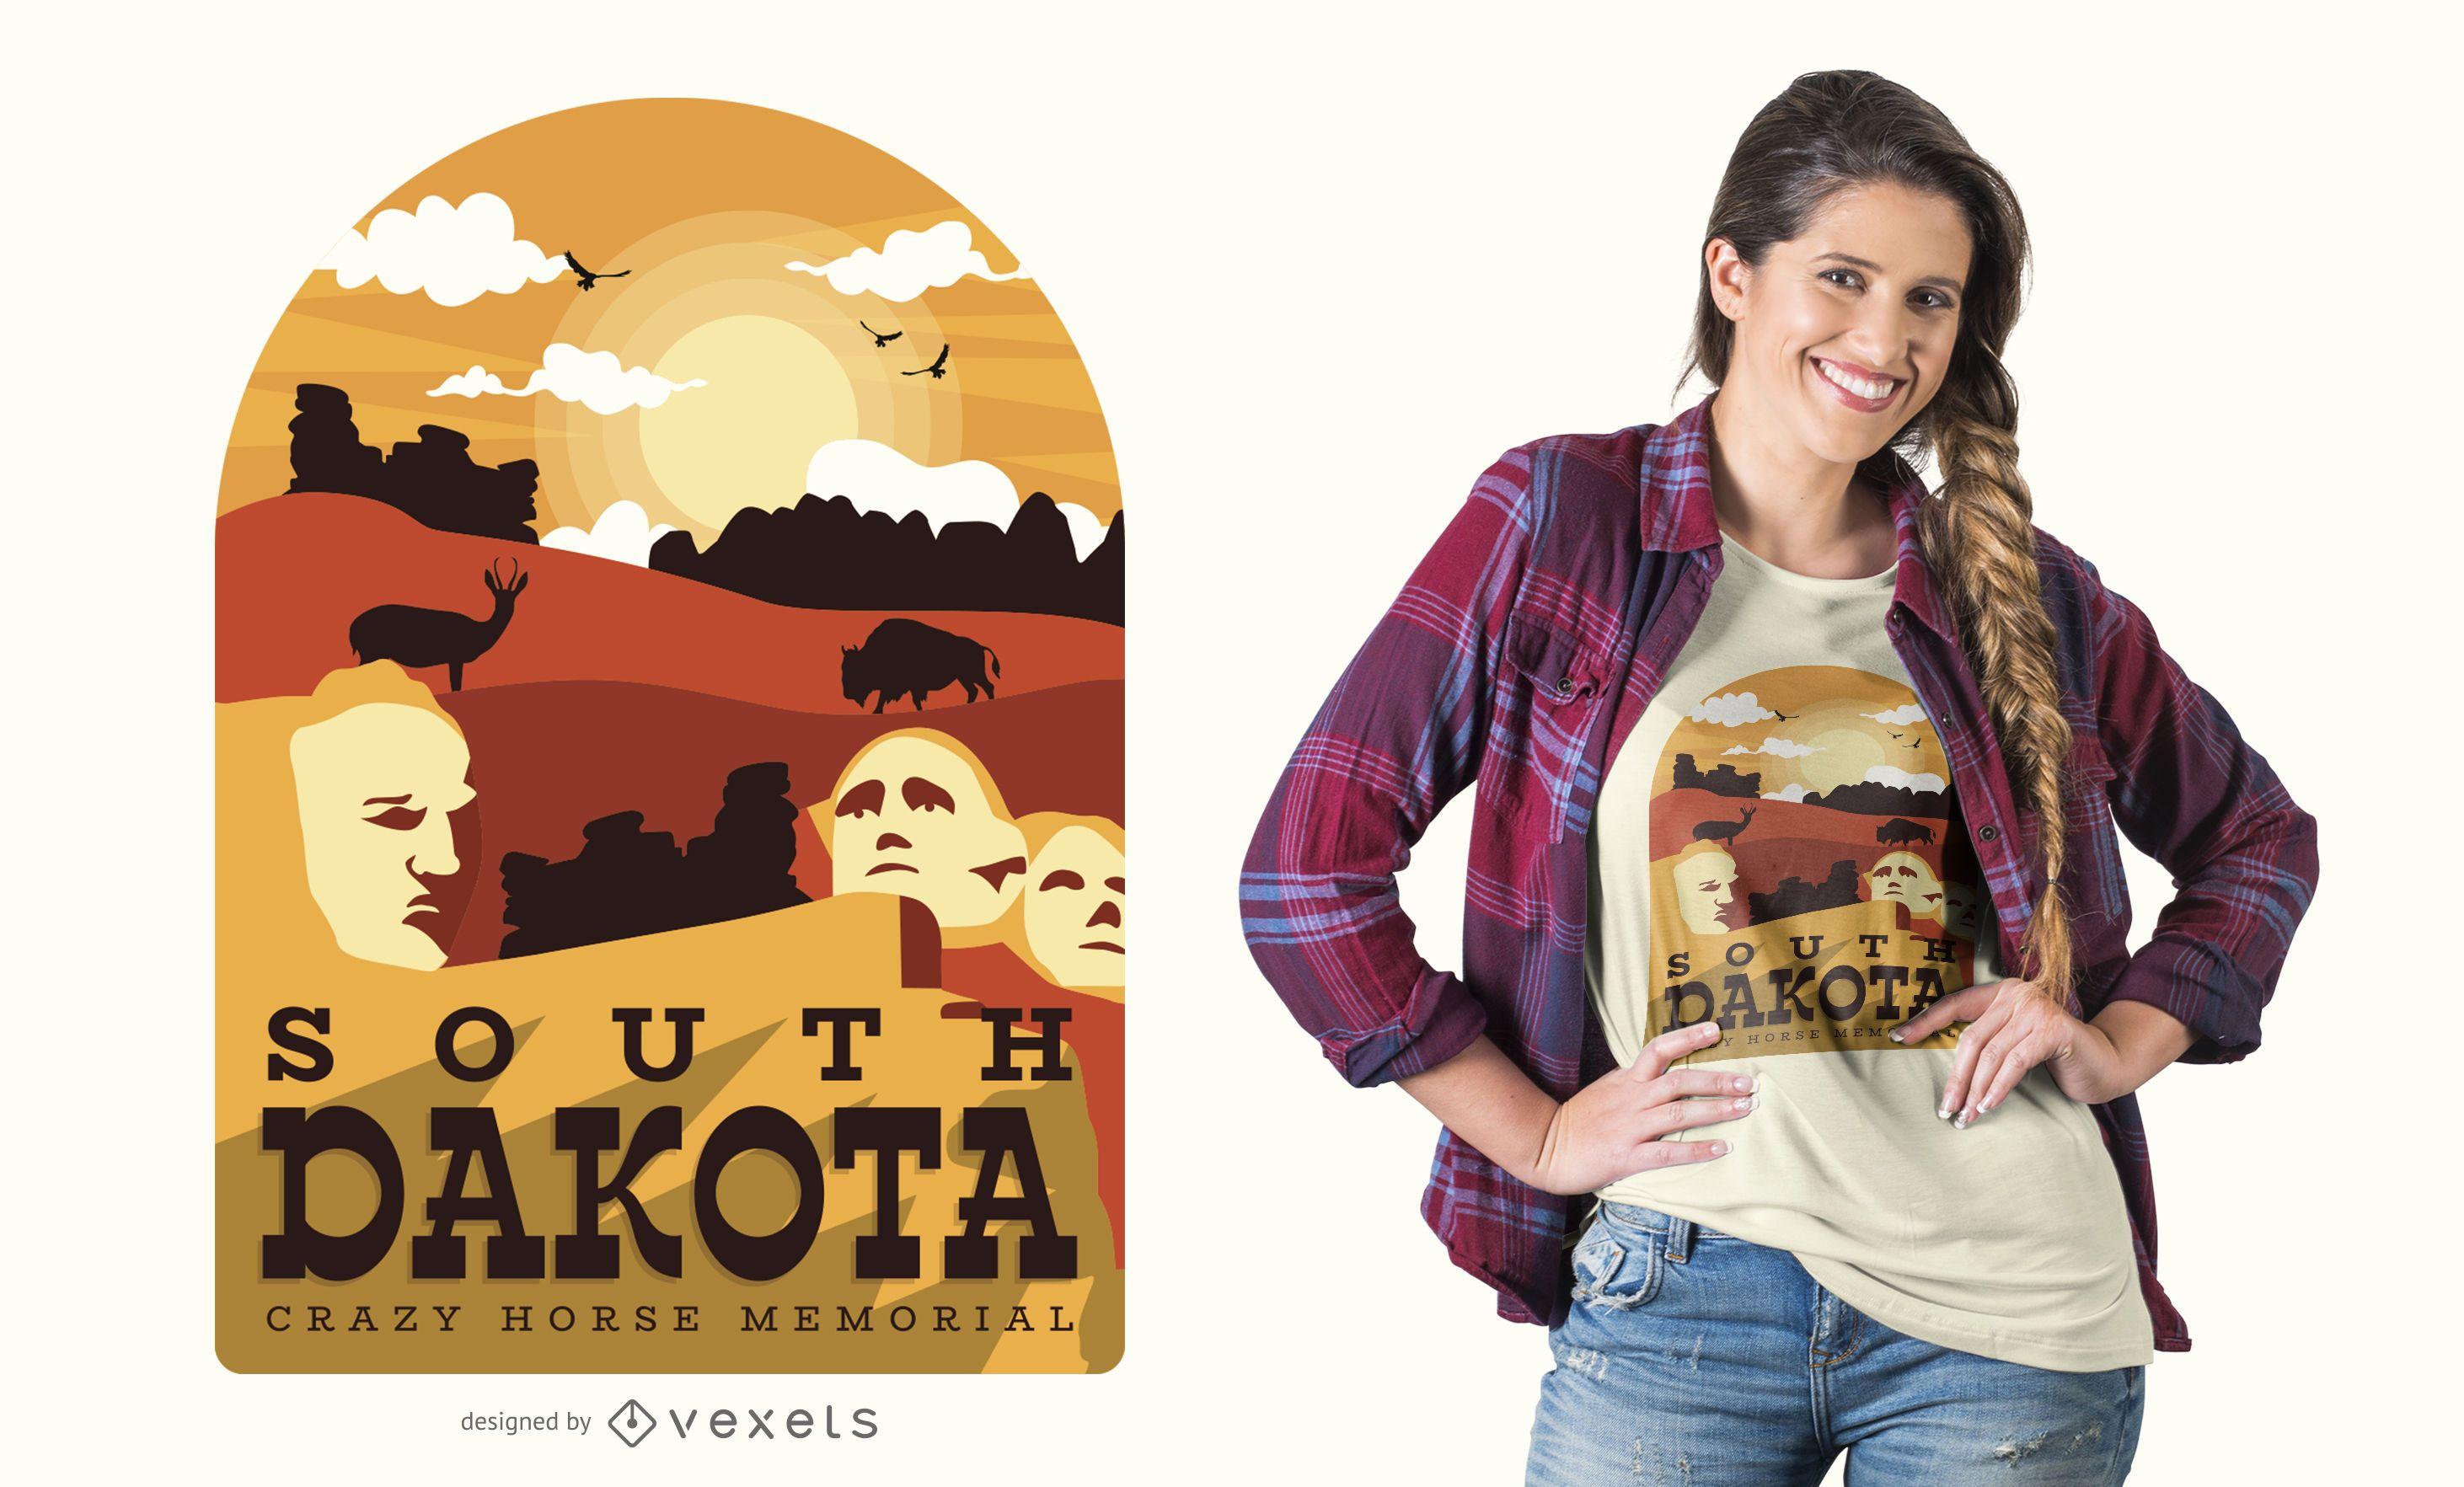 South Dakota t-shirt design